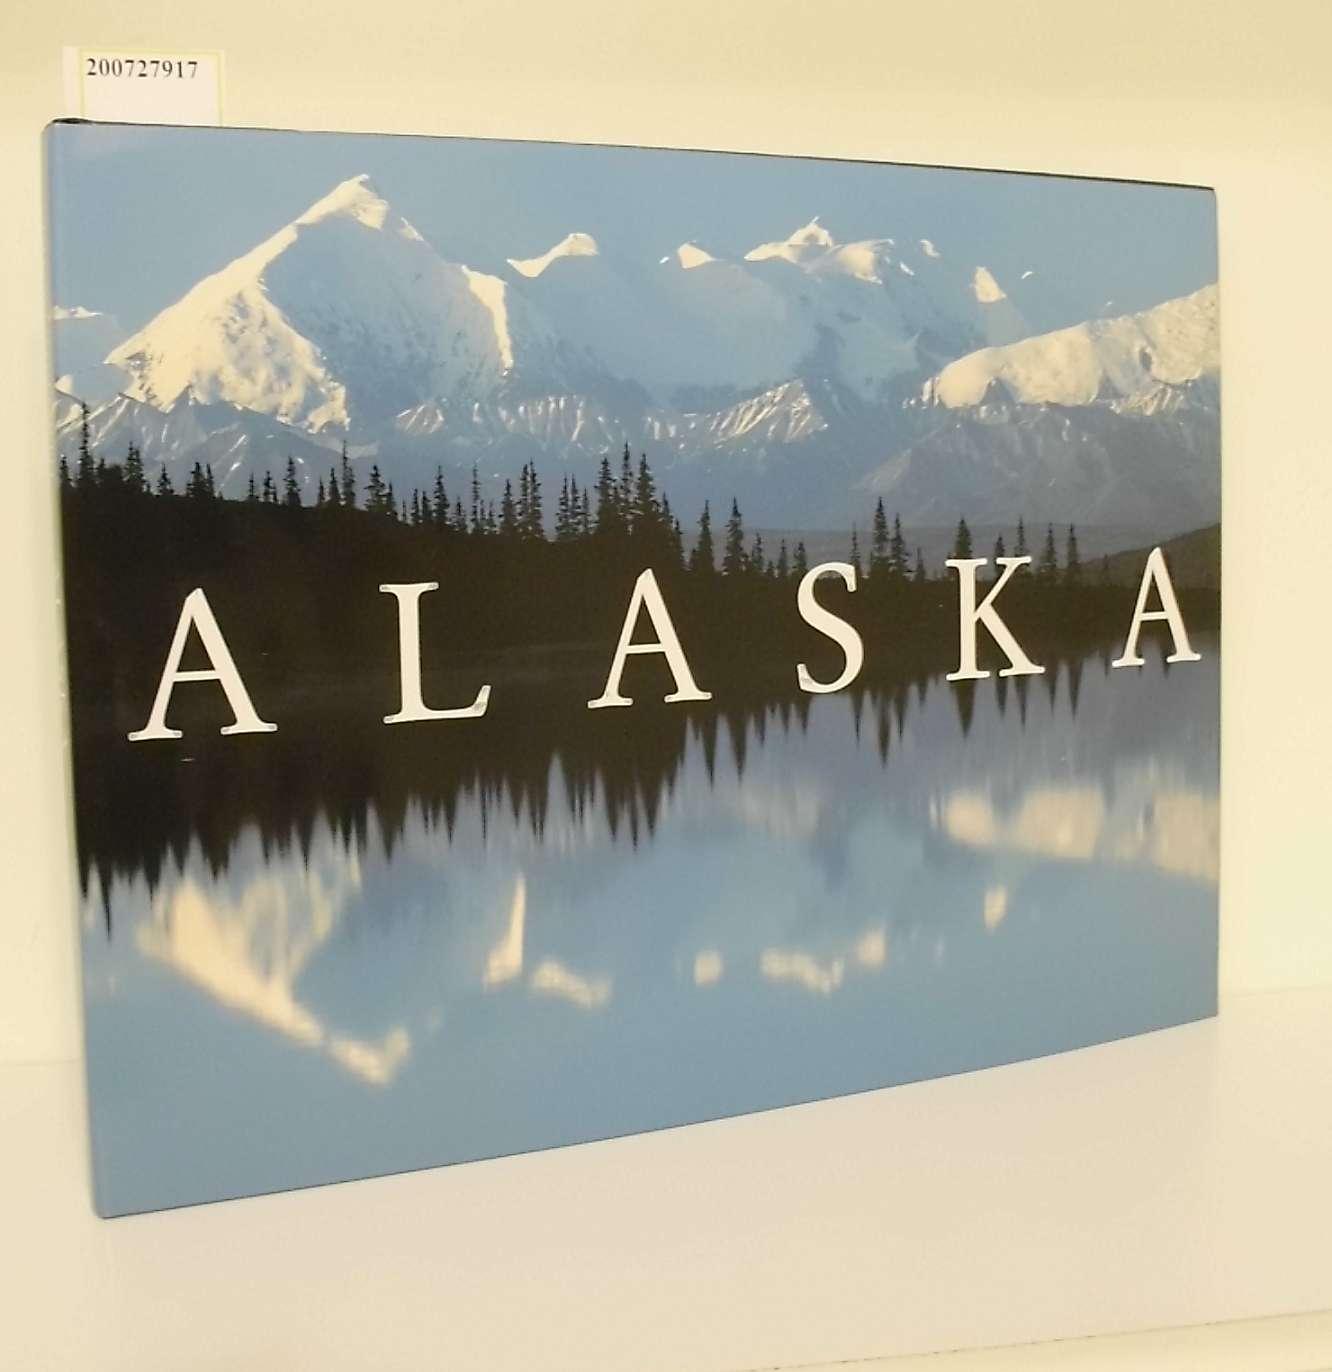 Alaska / hrsg. von Dana Levy und Letitia Burns O